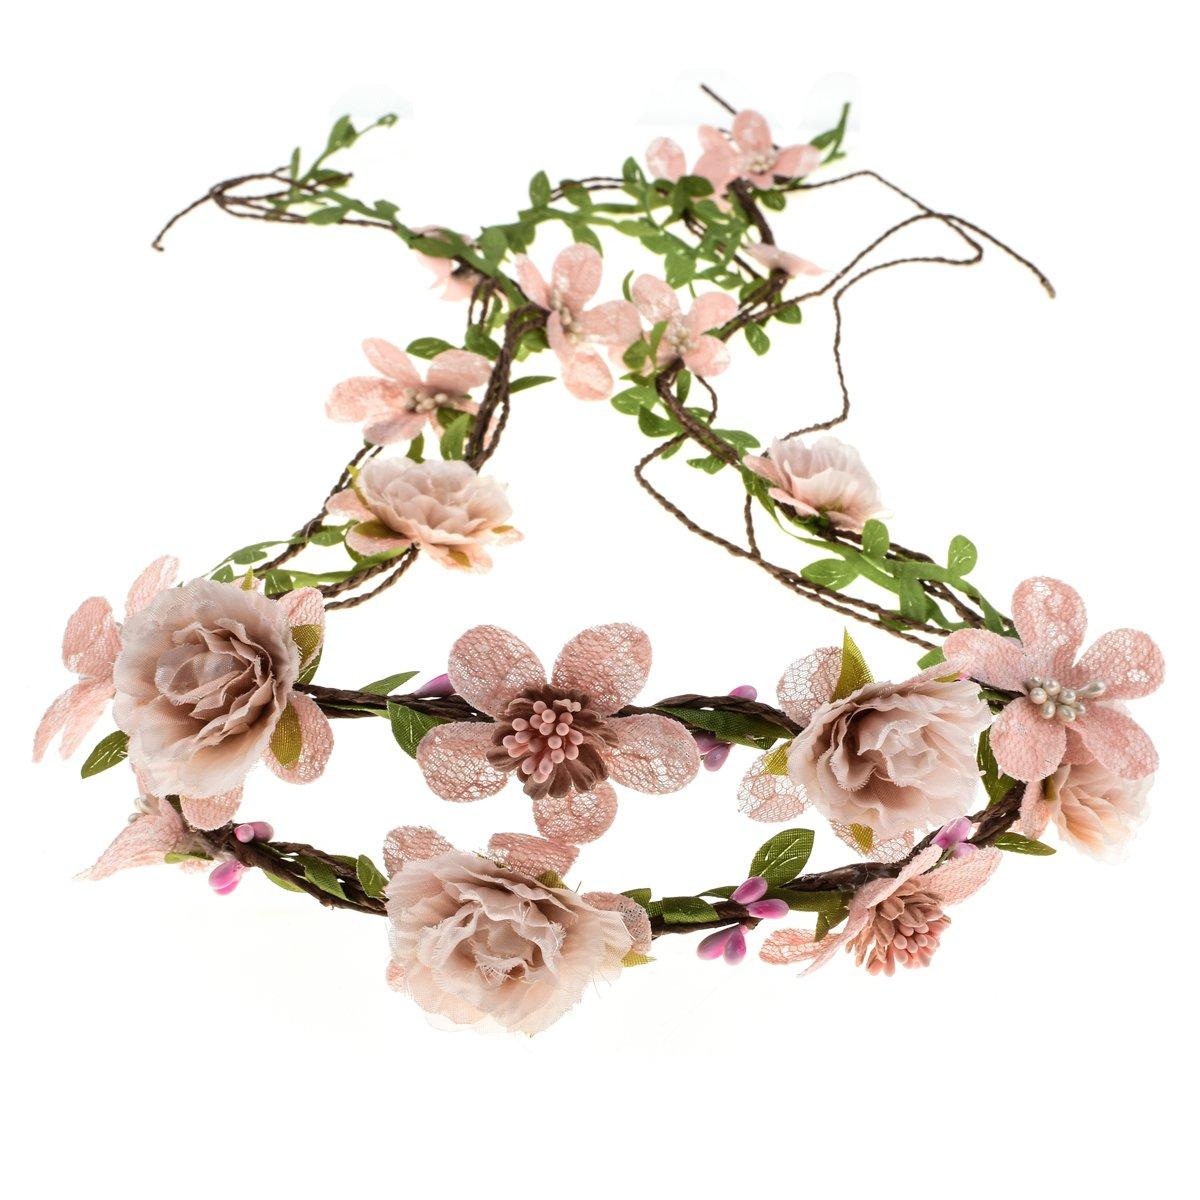 Best Floral Centerpieces For Weddings Amazon